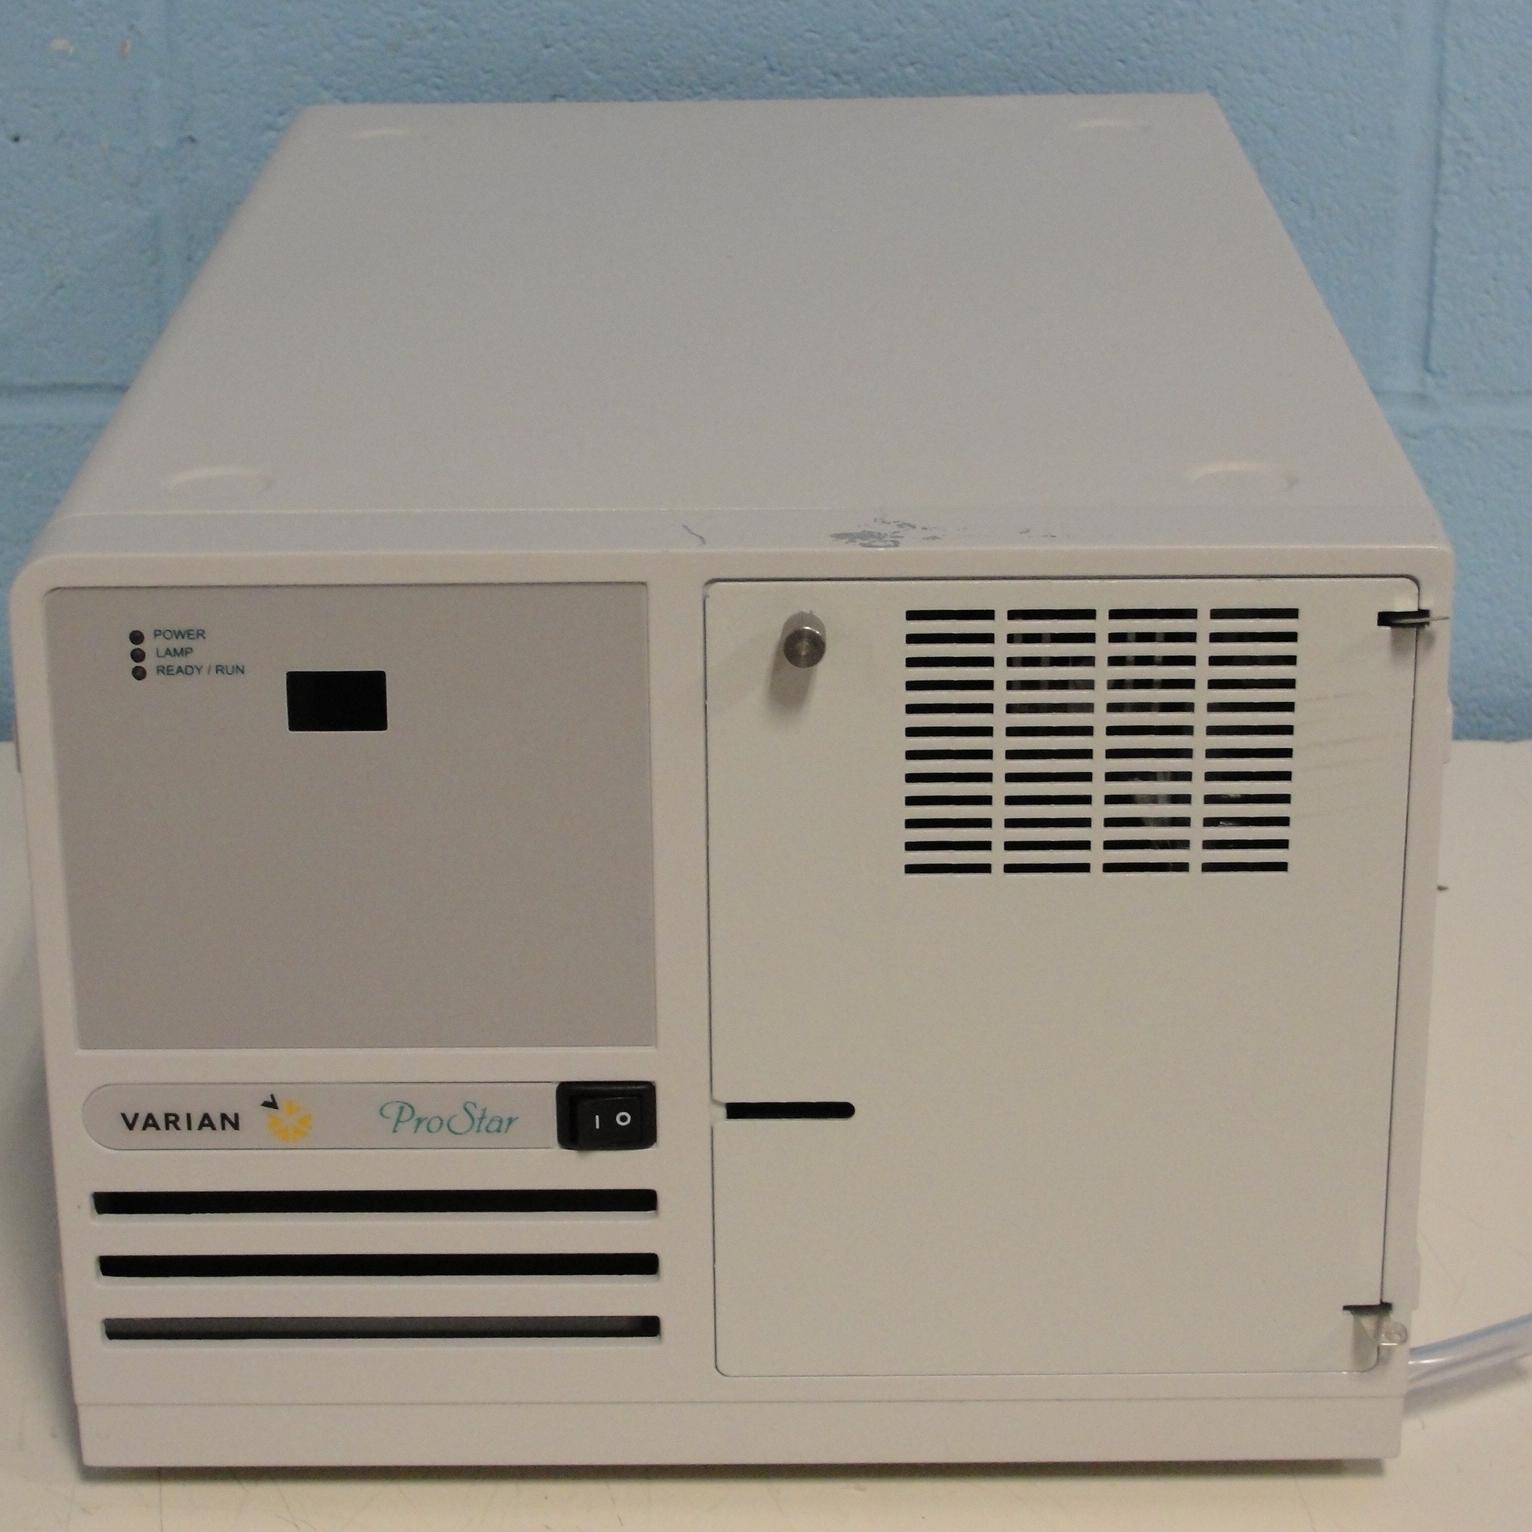 Varian ProStar 325 UV-Vis Detector Image